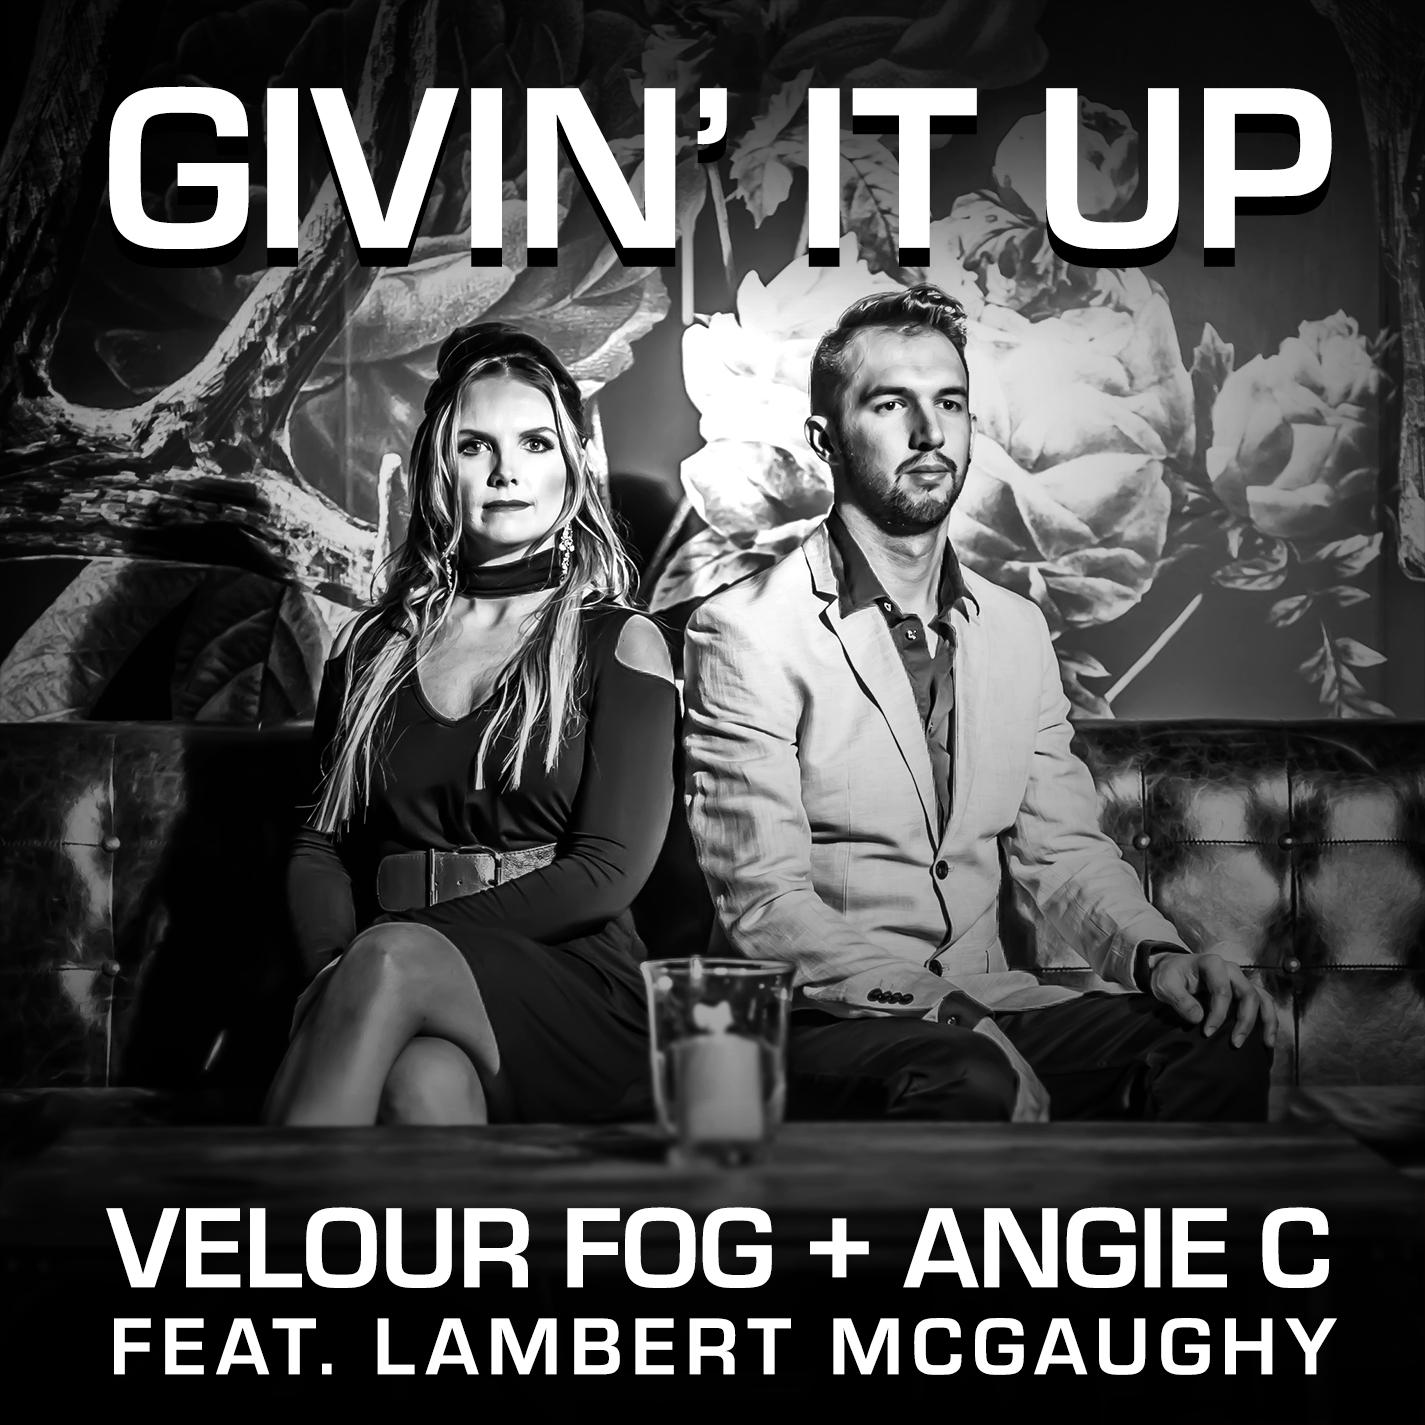 Velour Fog & Angie C feat. Lambert McGaughy V2h.jpg